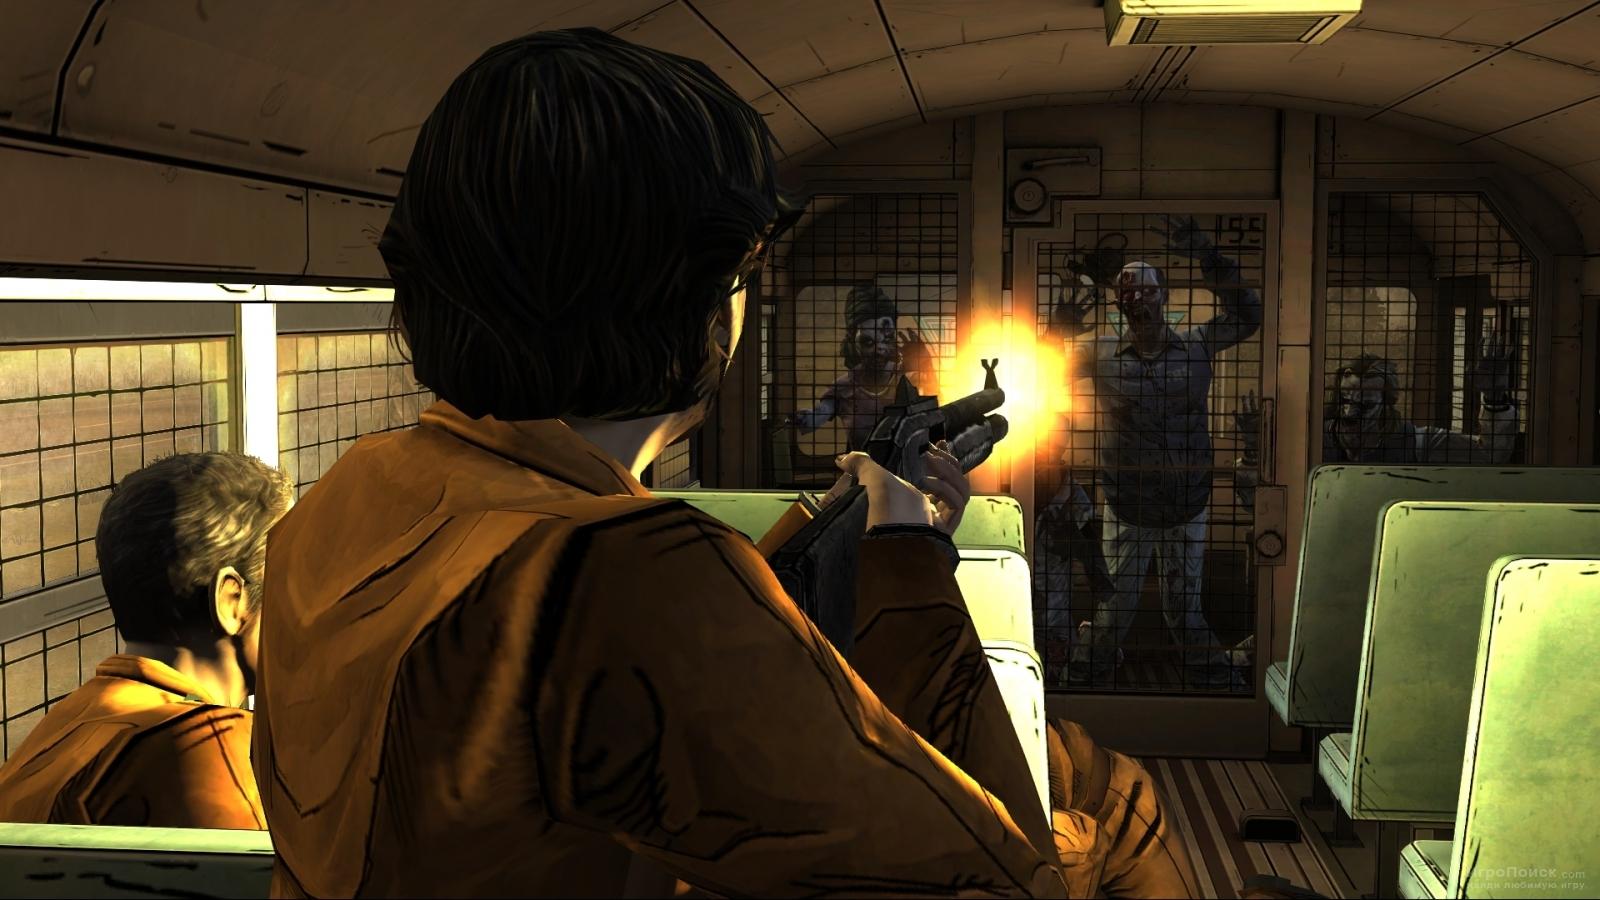 Скриншот к игре The Walking Dead: 400 days